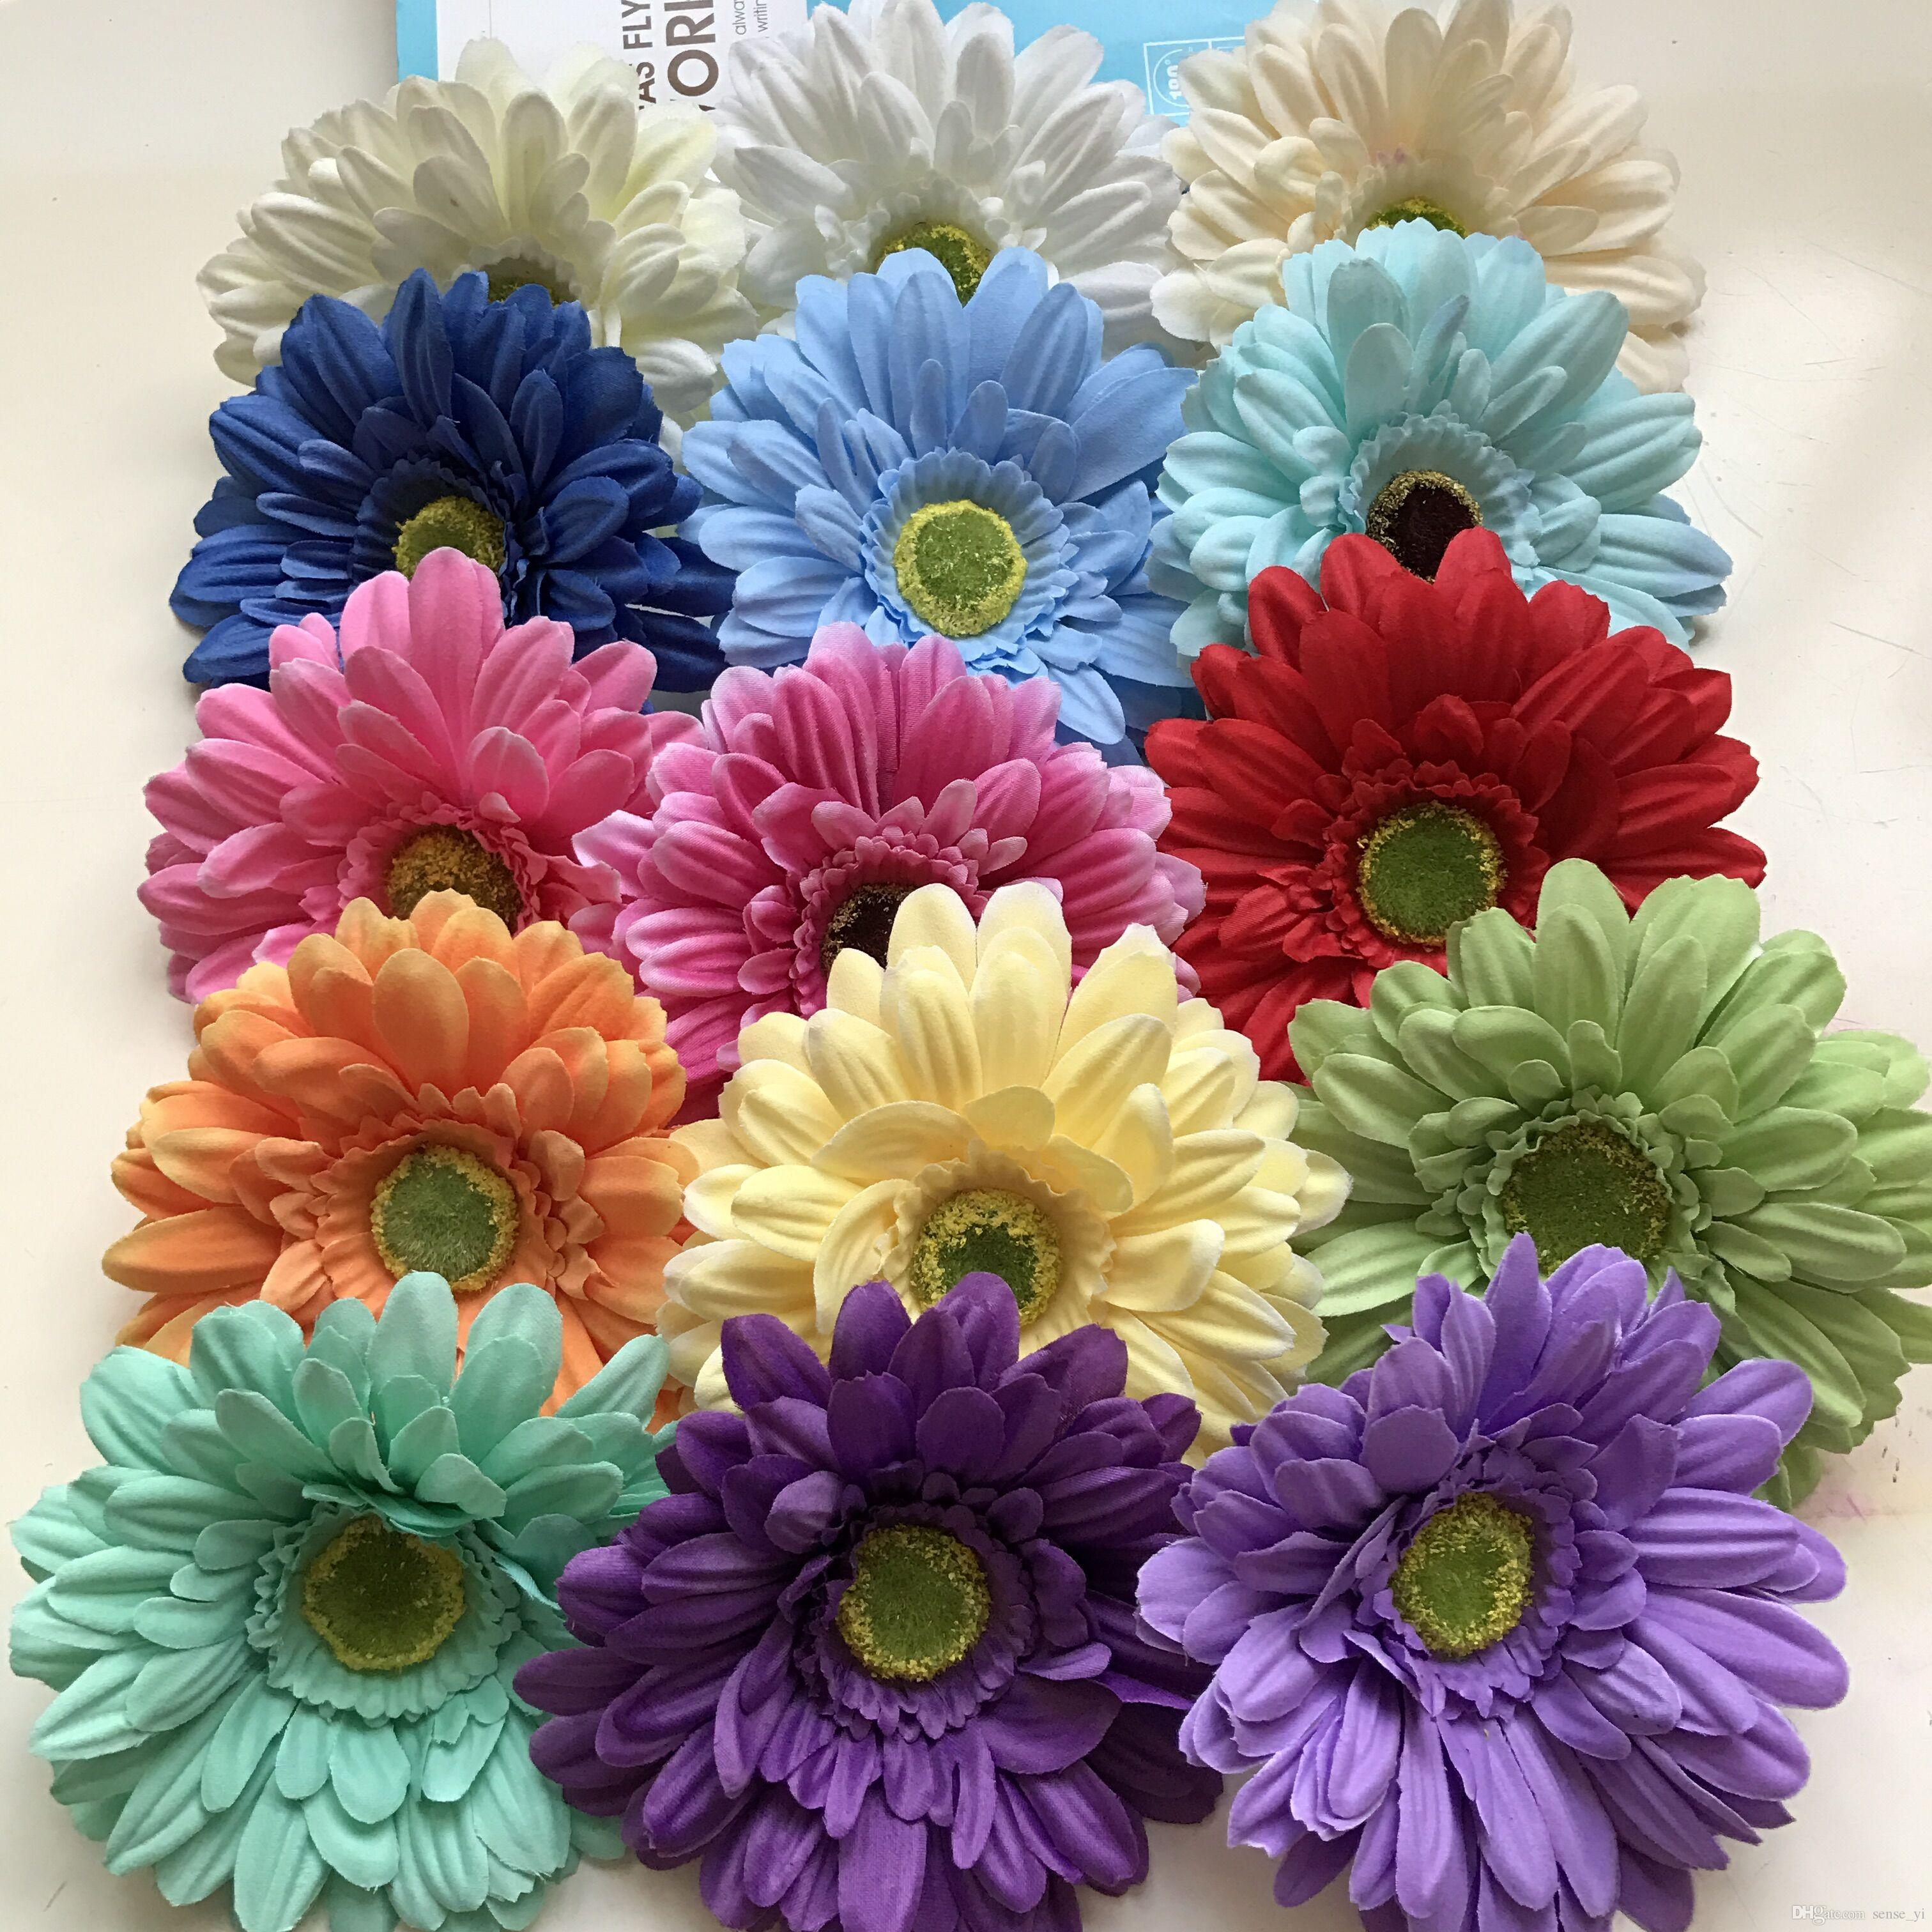 100pcs Silk Daisy Artificial Flowers For Wedding Home Decoration 13cm Chrysanthemum Mariage Flores Decorative Flowers Plants